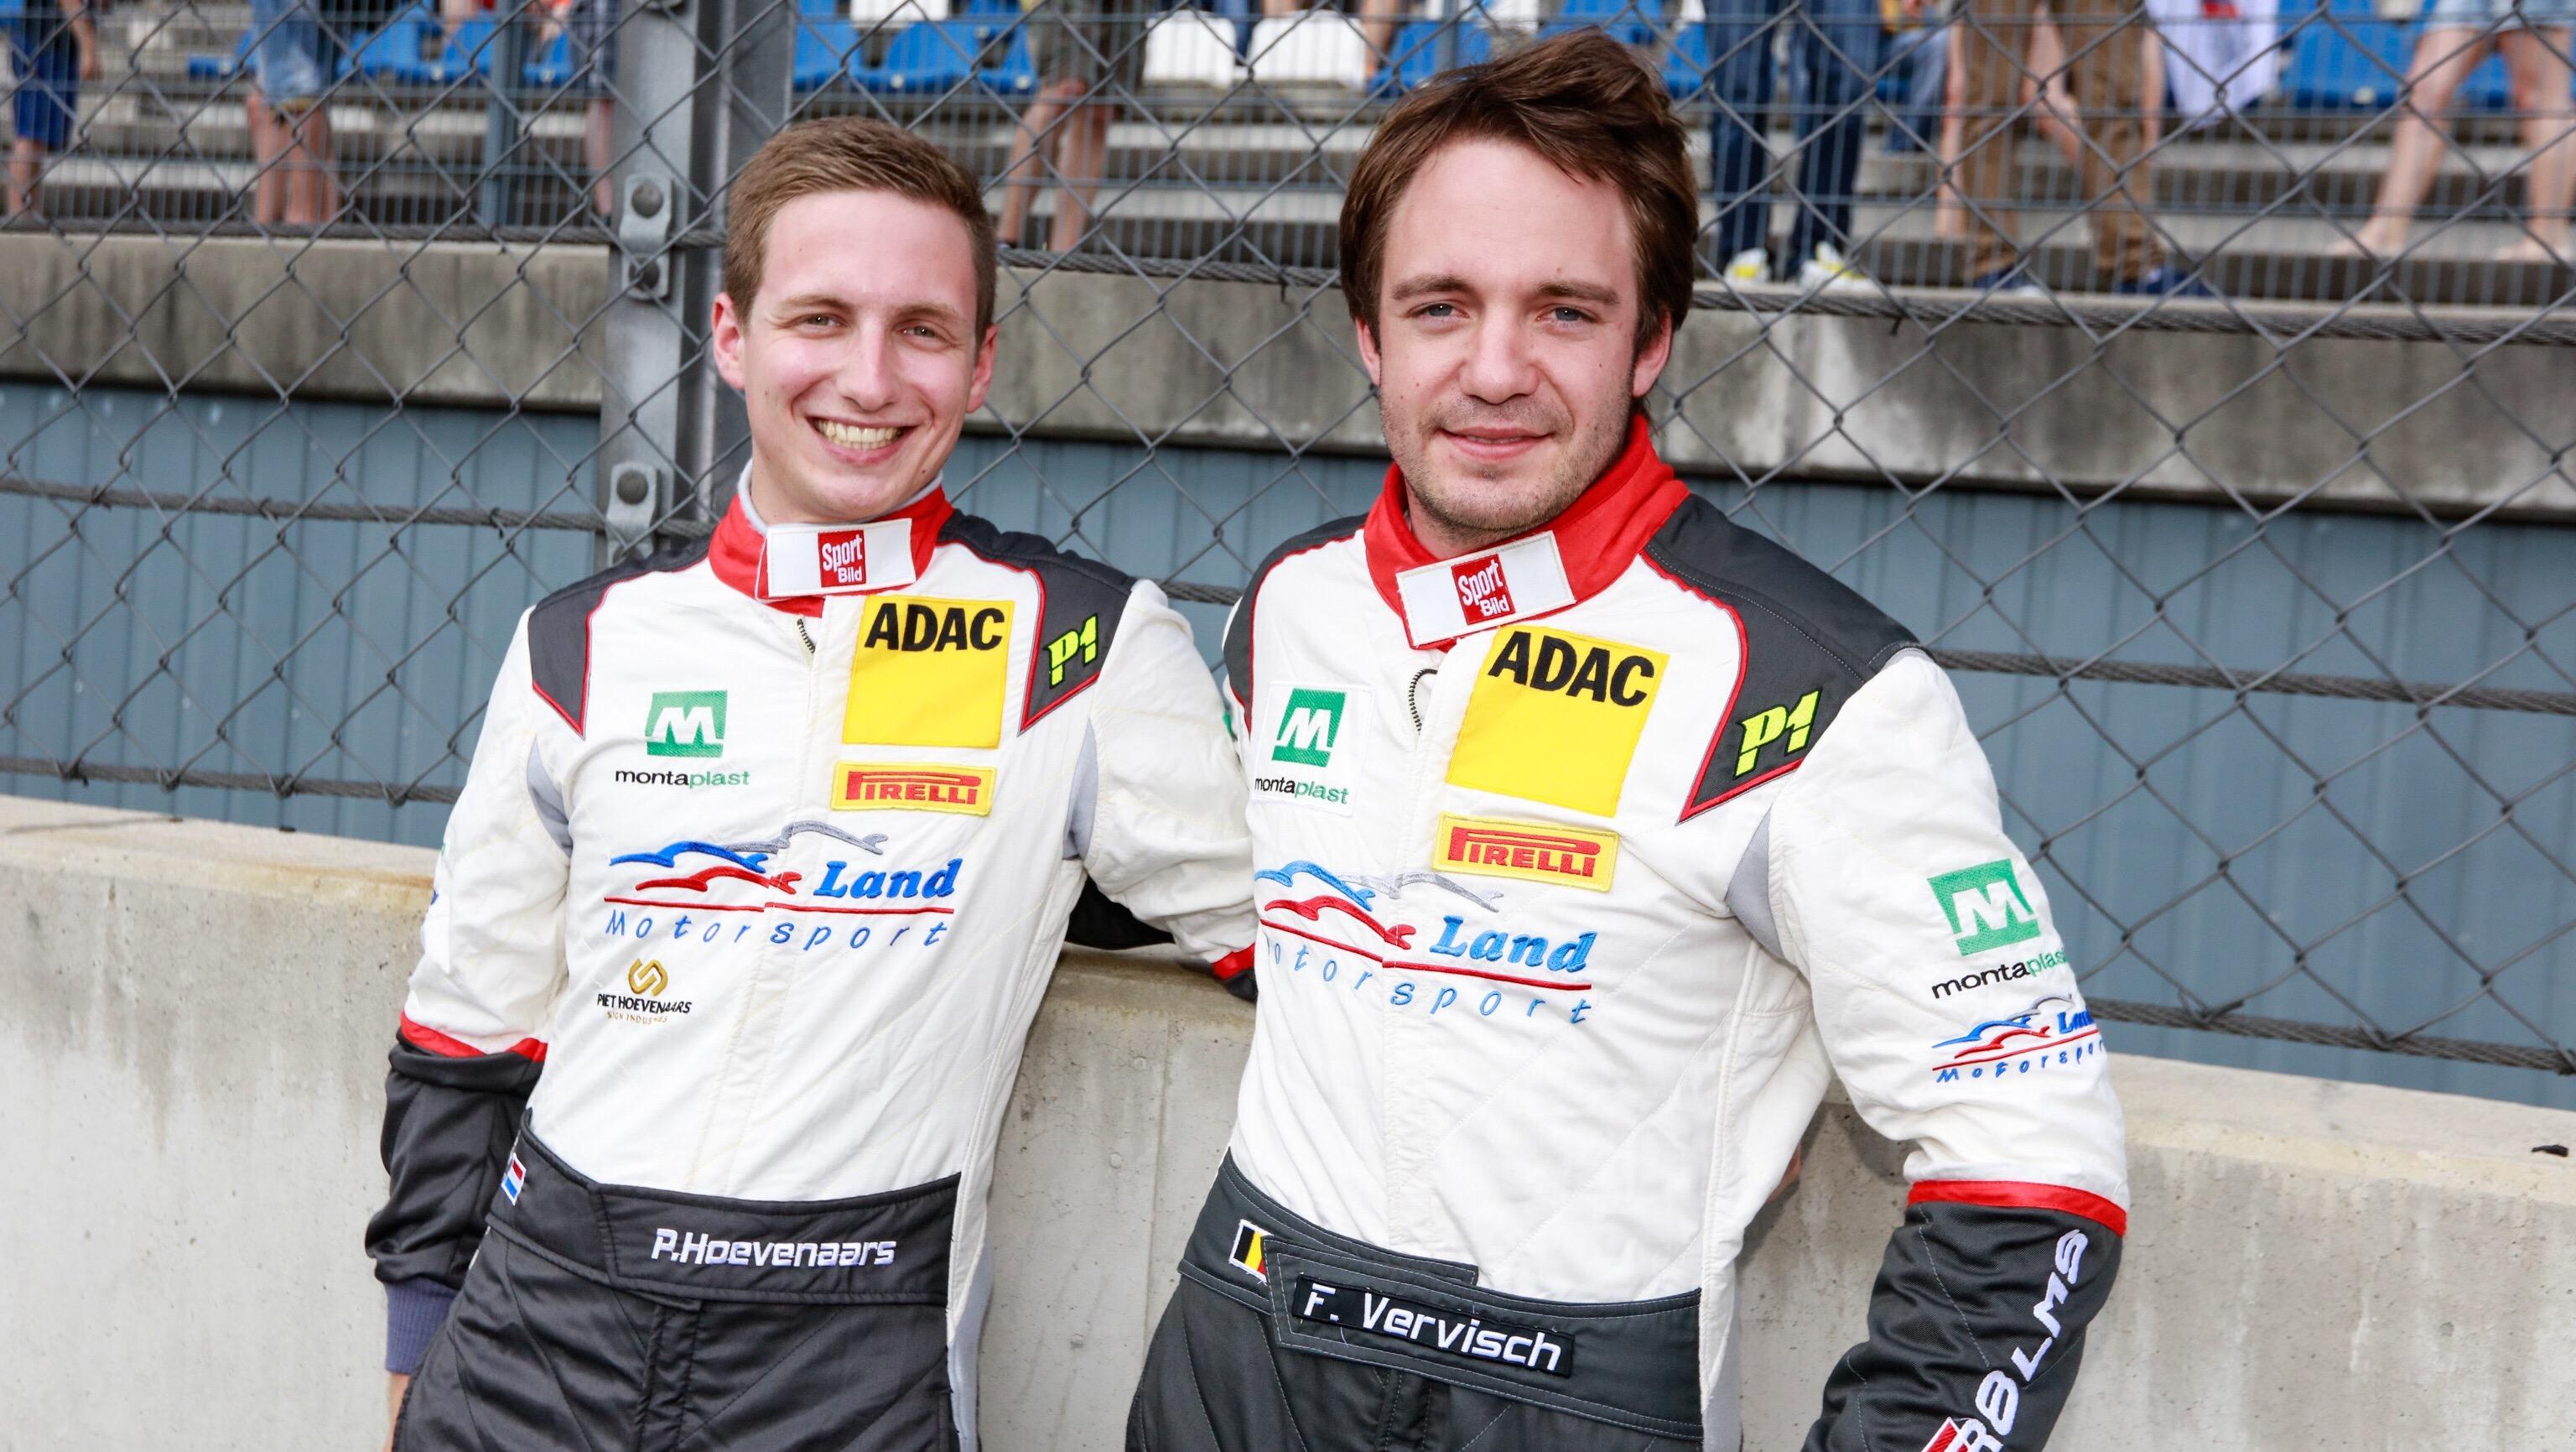 ADAC GT Masters - Lausitzring 2016, GER - Foto: Gruppe C